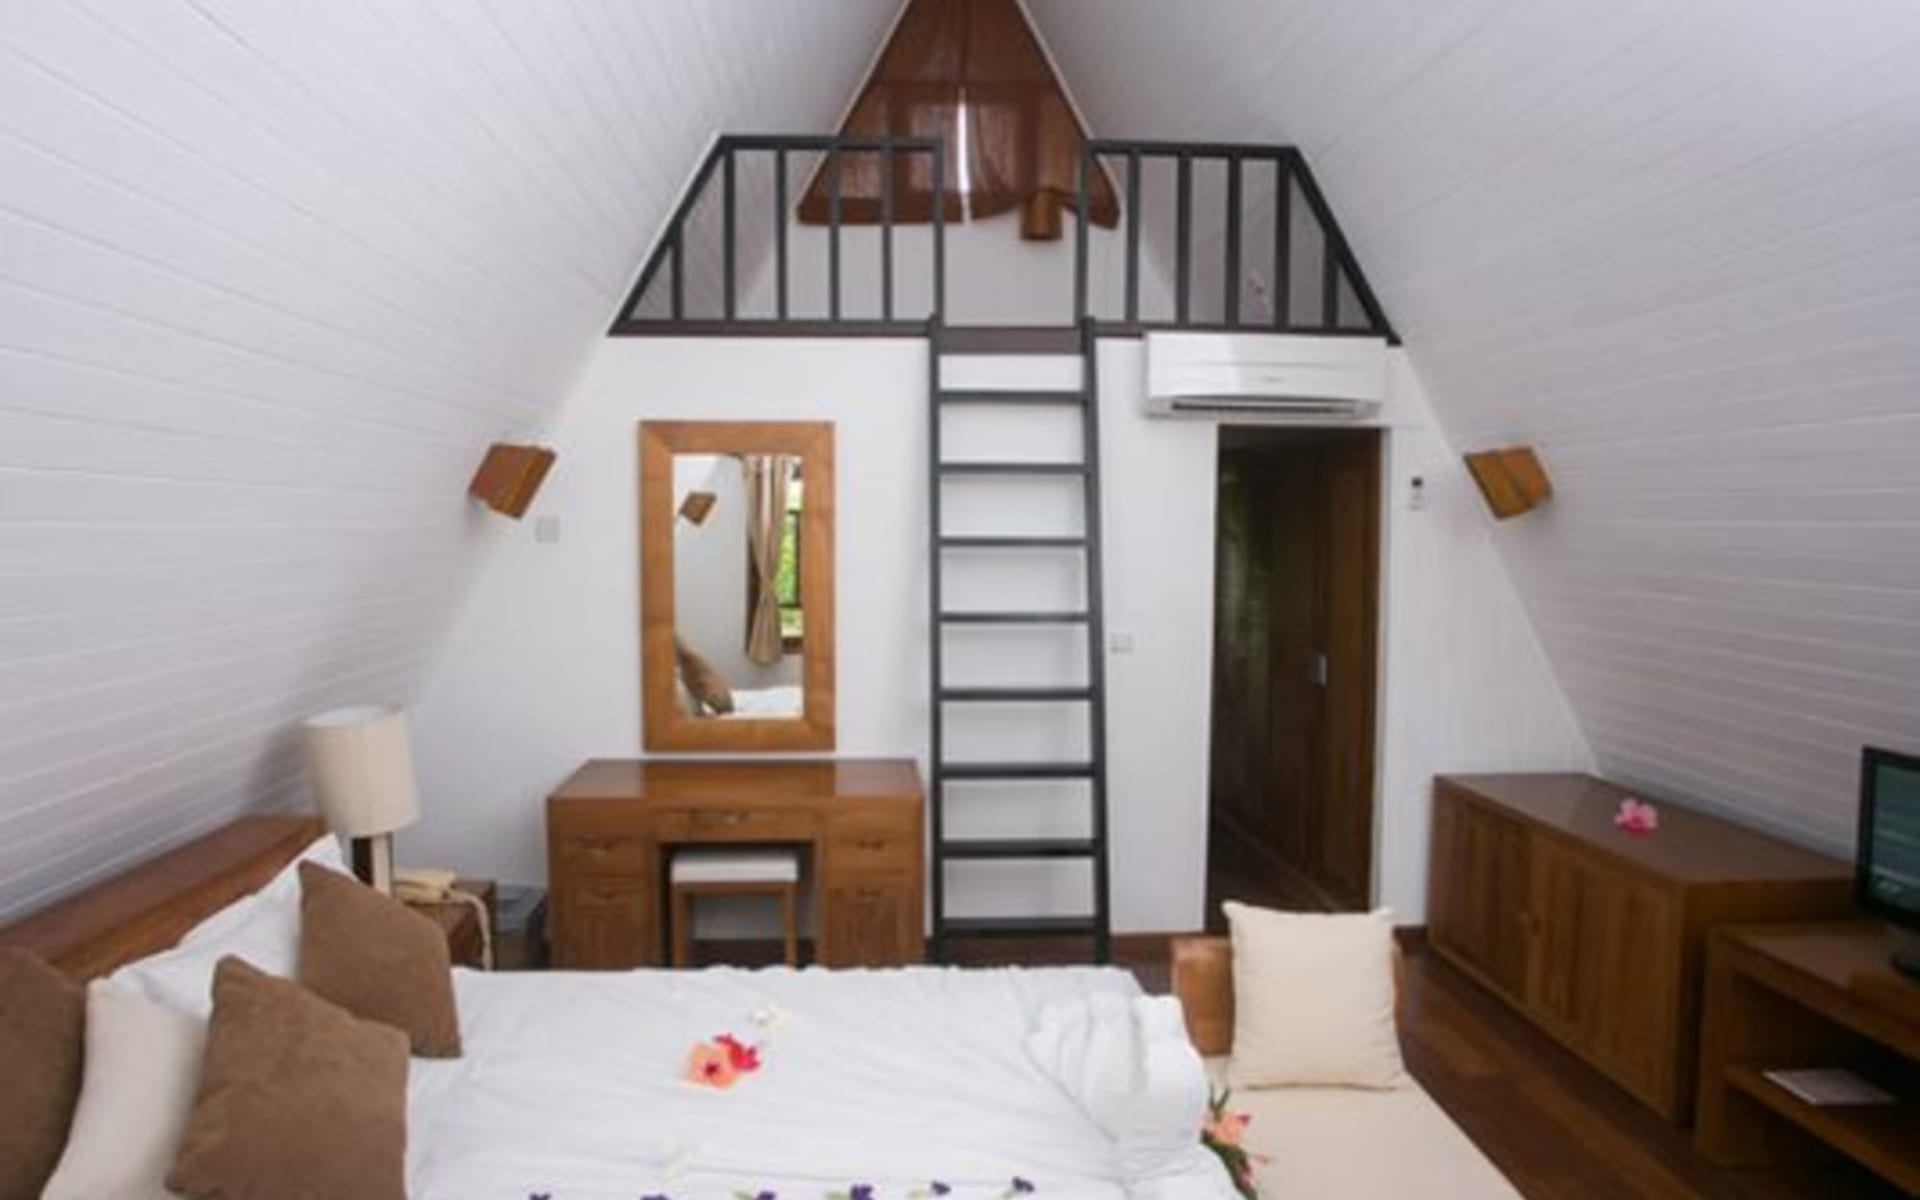 La Digue Island Lodge:  Beach Chalet